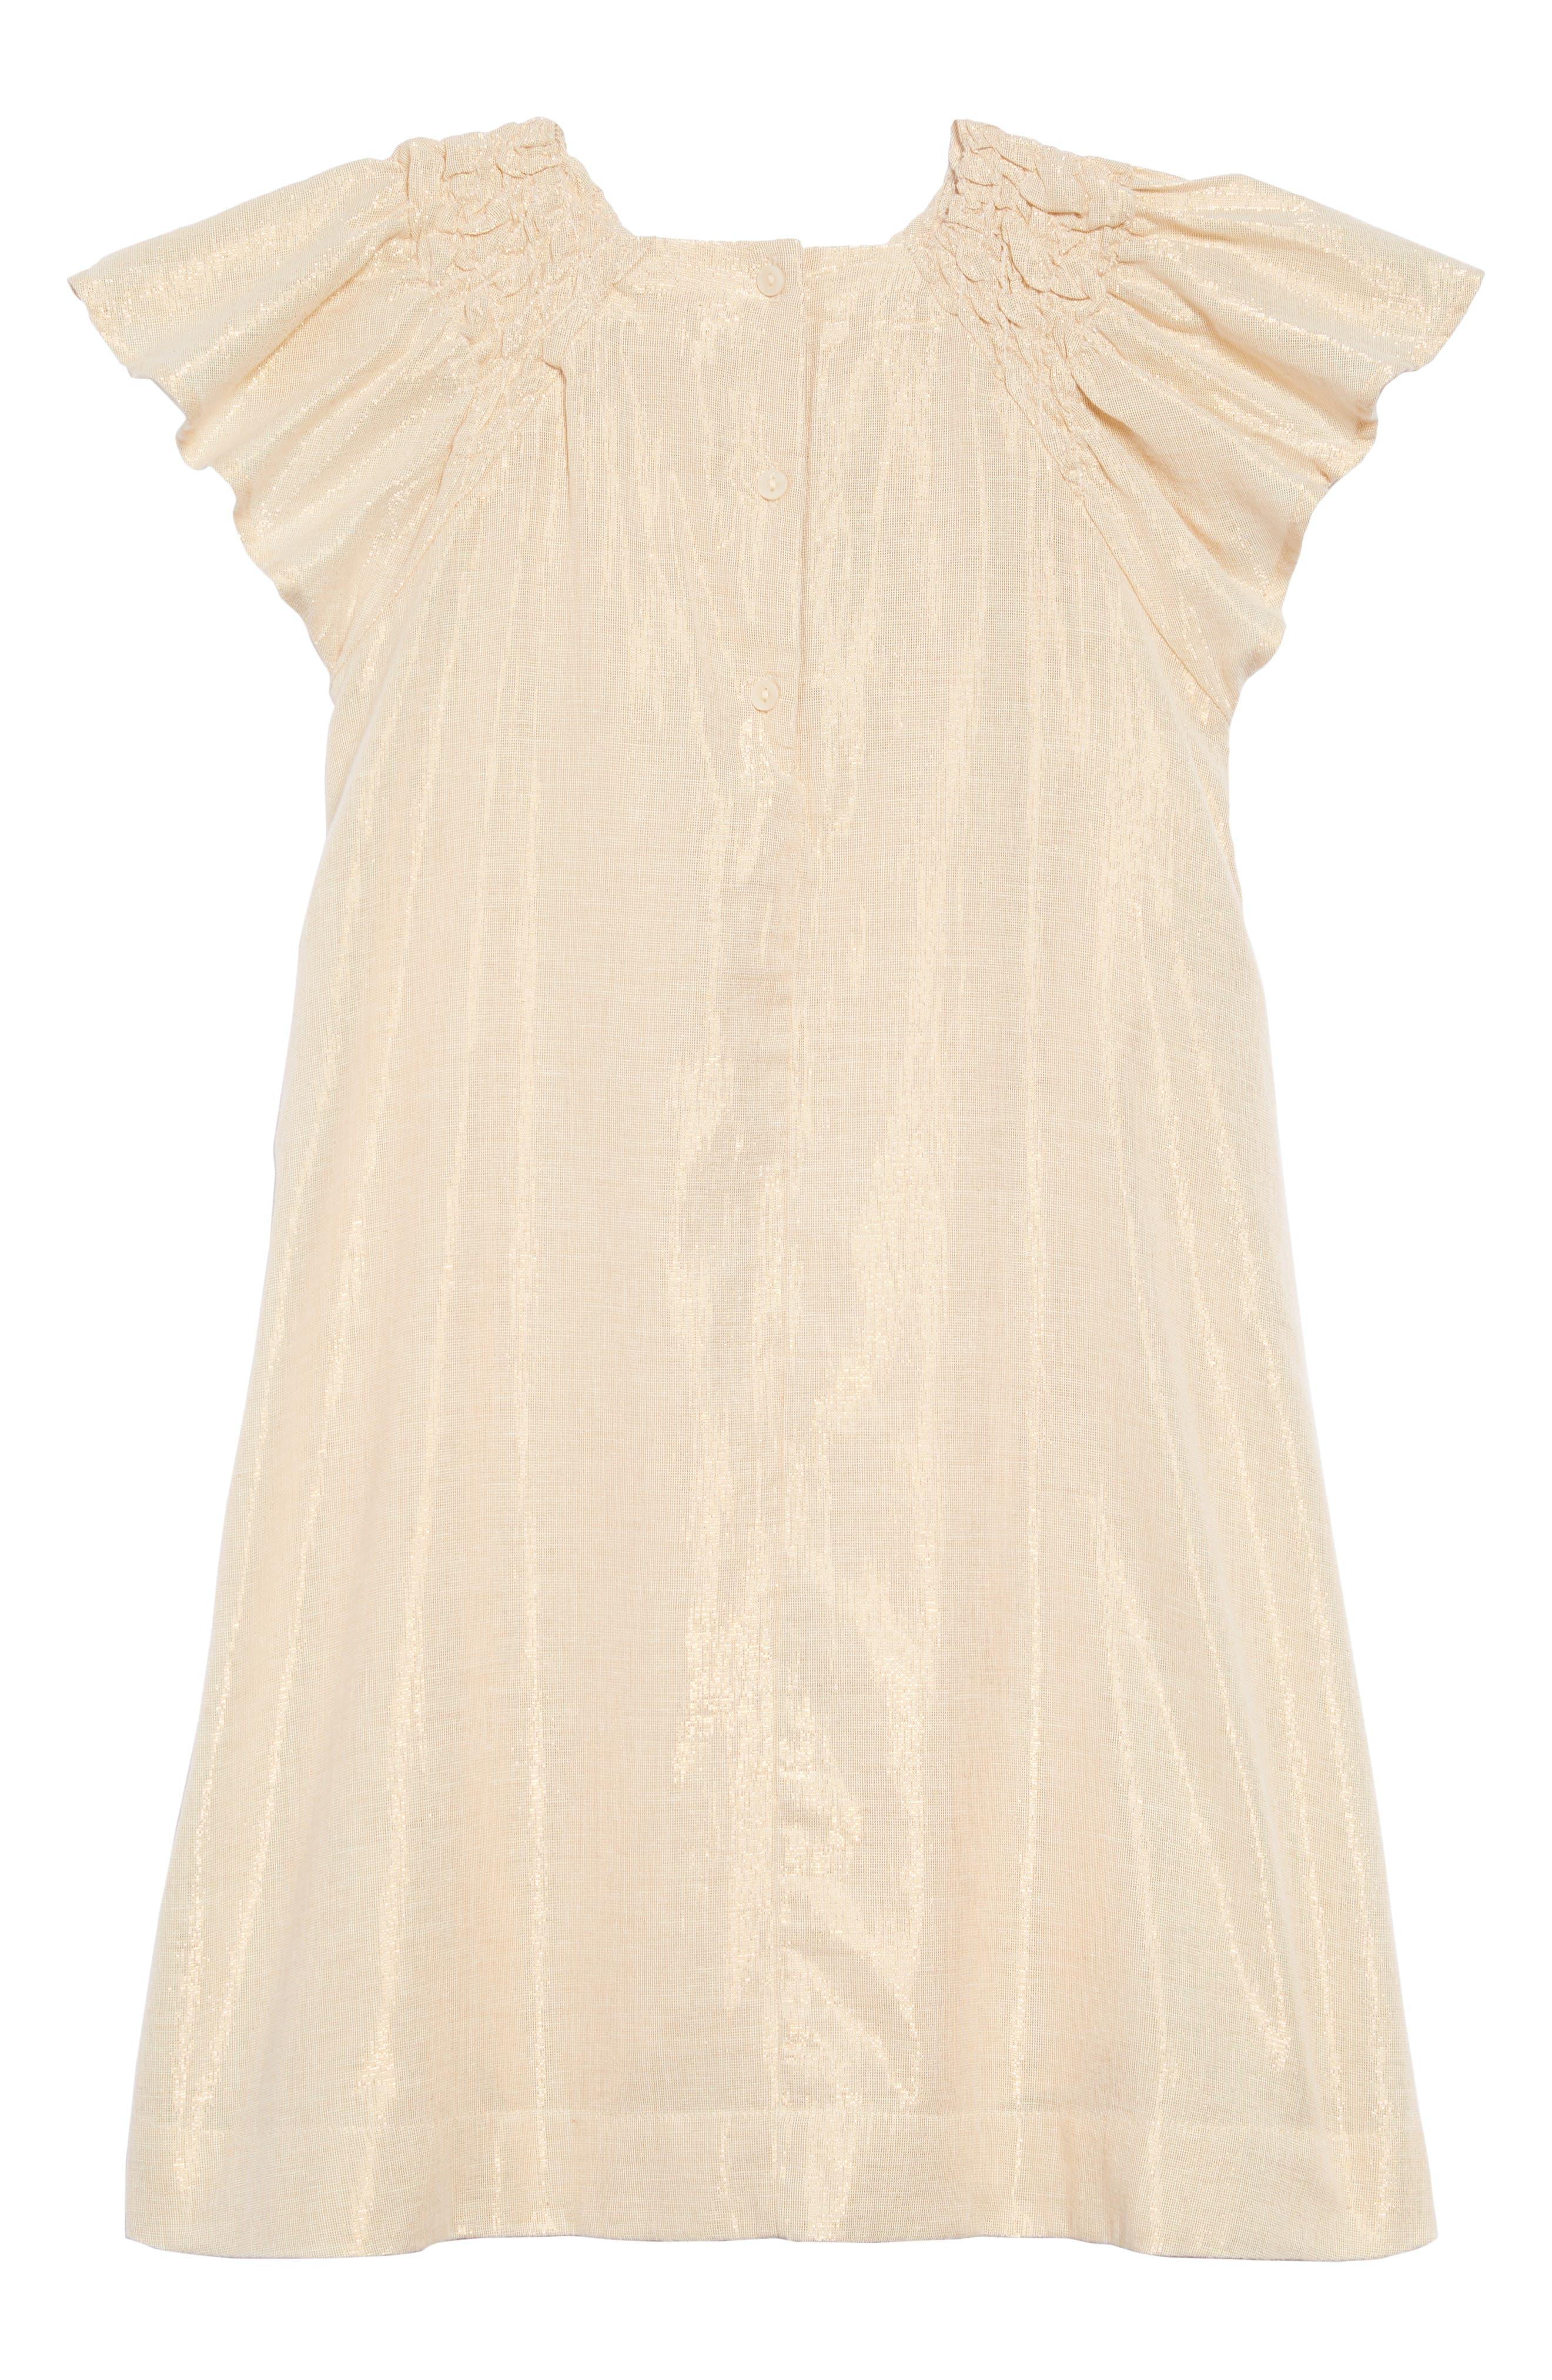 Rosie Sparkle Dress,                             Alternate thumbnail 2, color,                             METALLIC GOLD